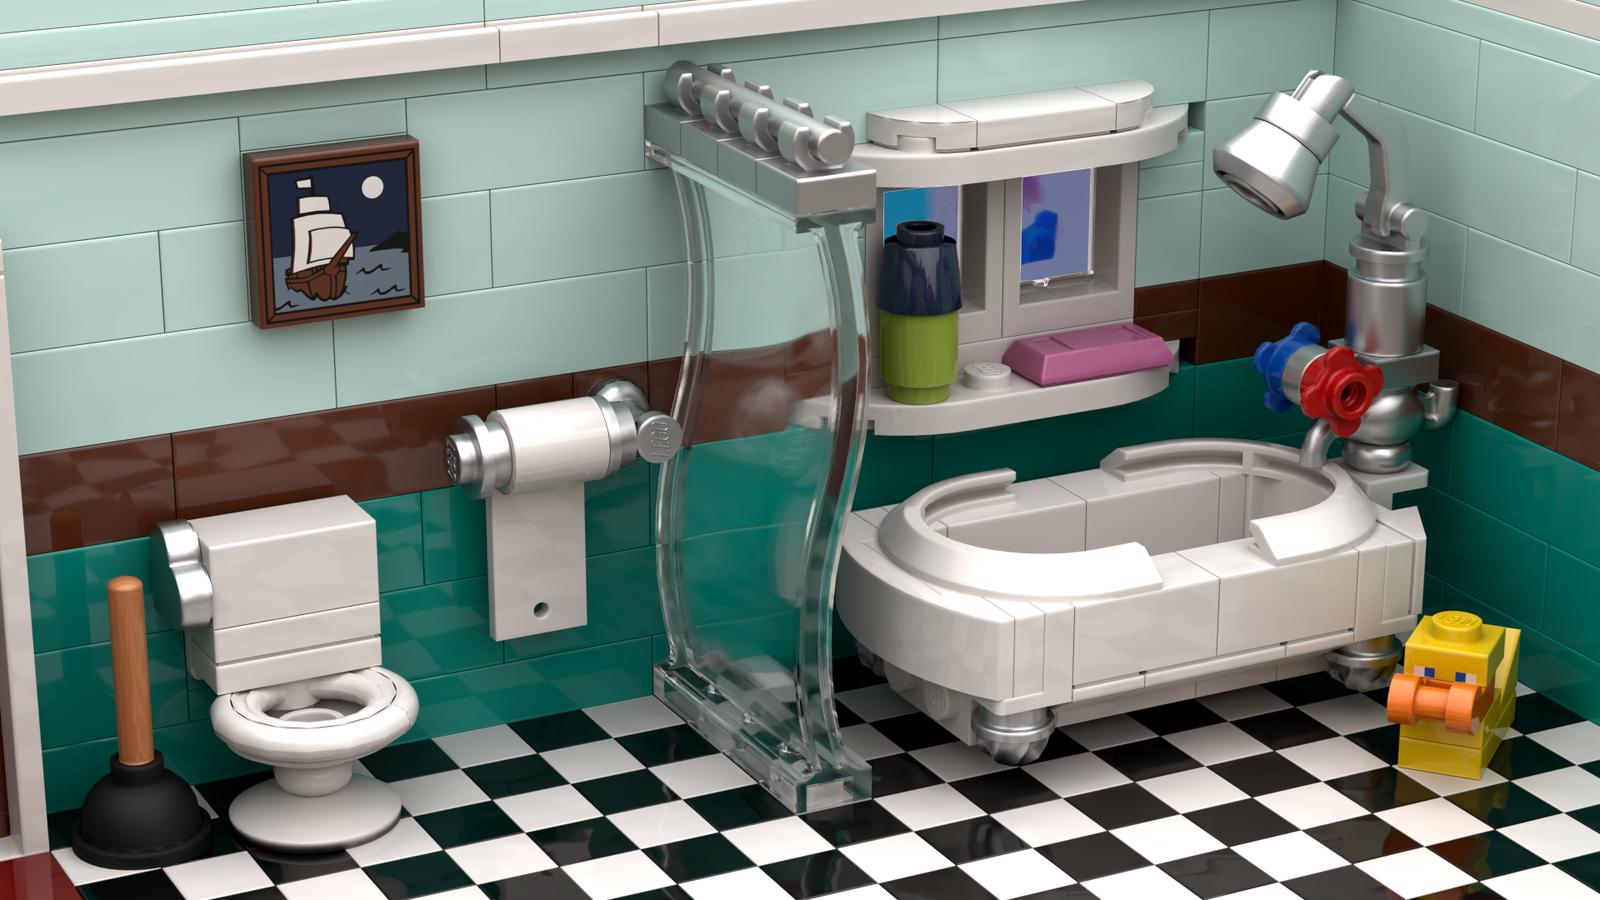 The Lou In 2020 Lego Furniture Lego Bathroom Lego Design